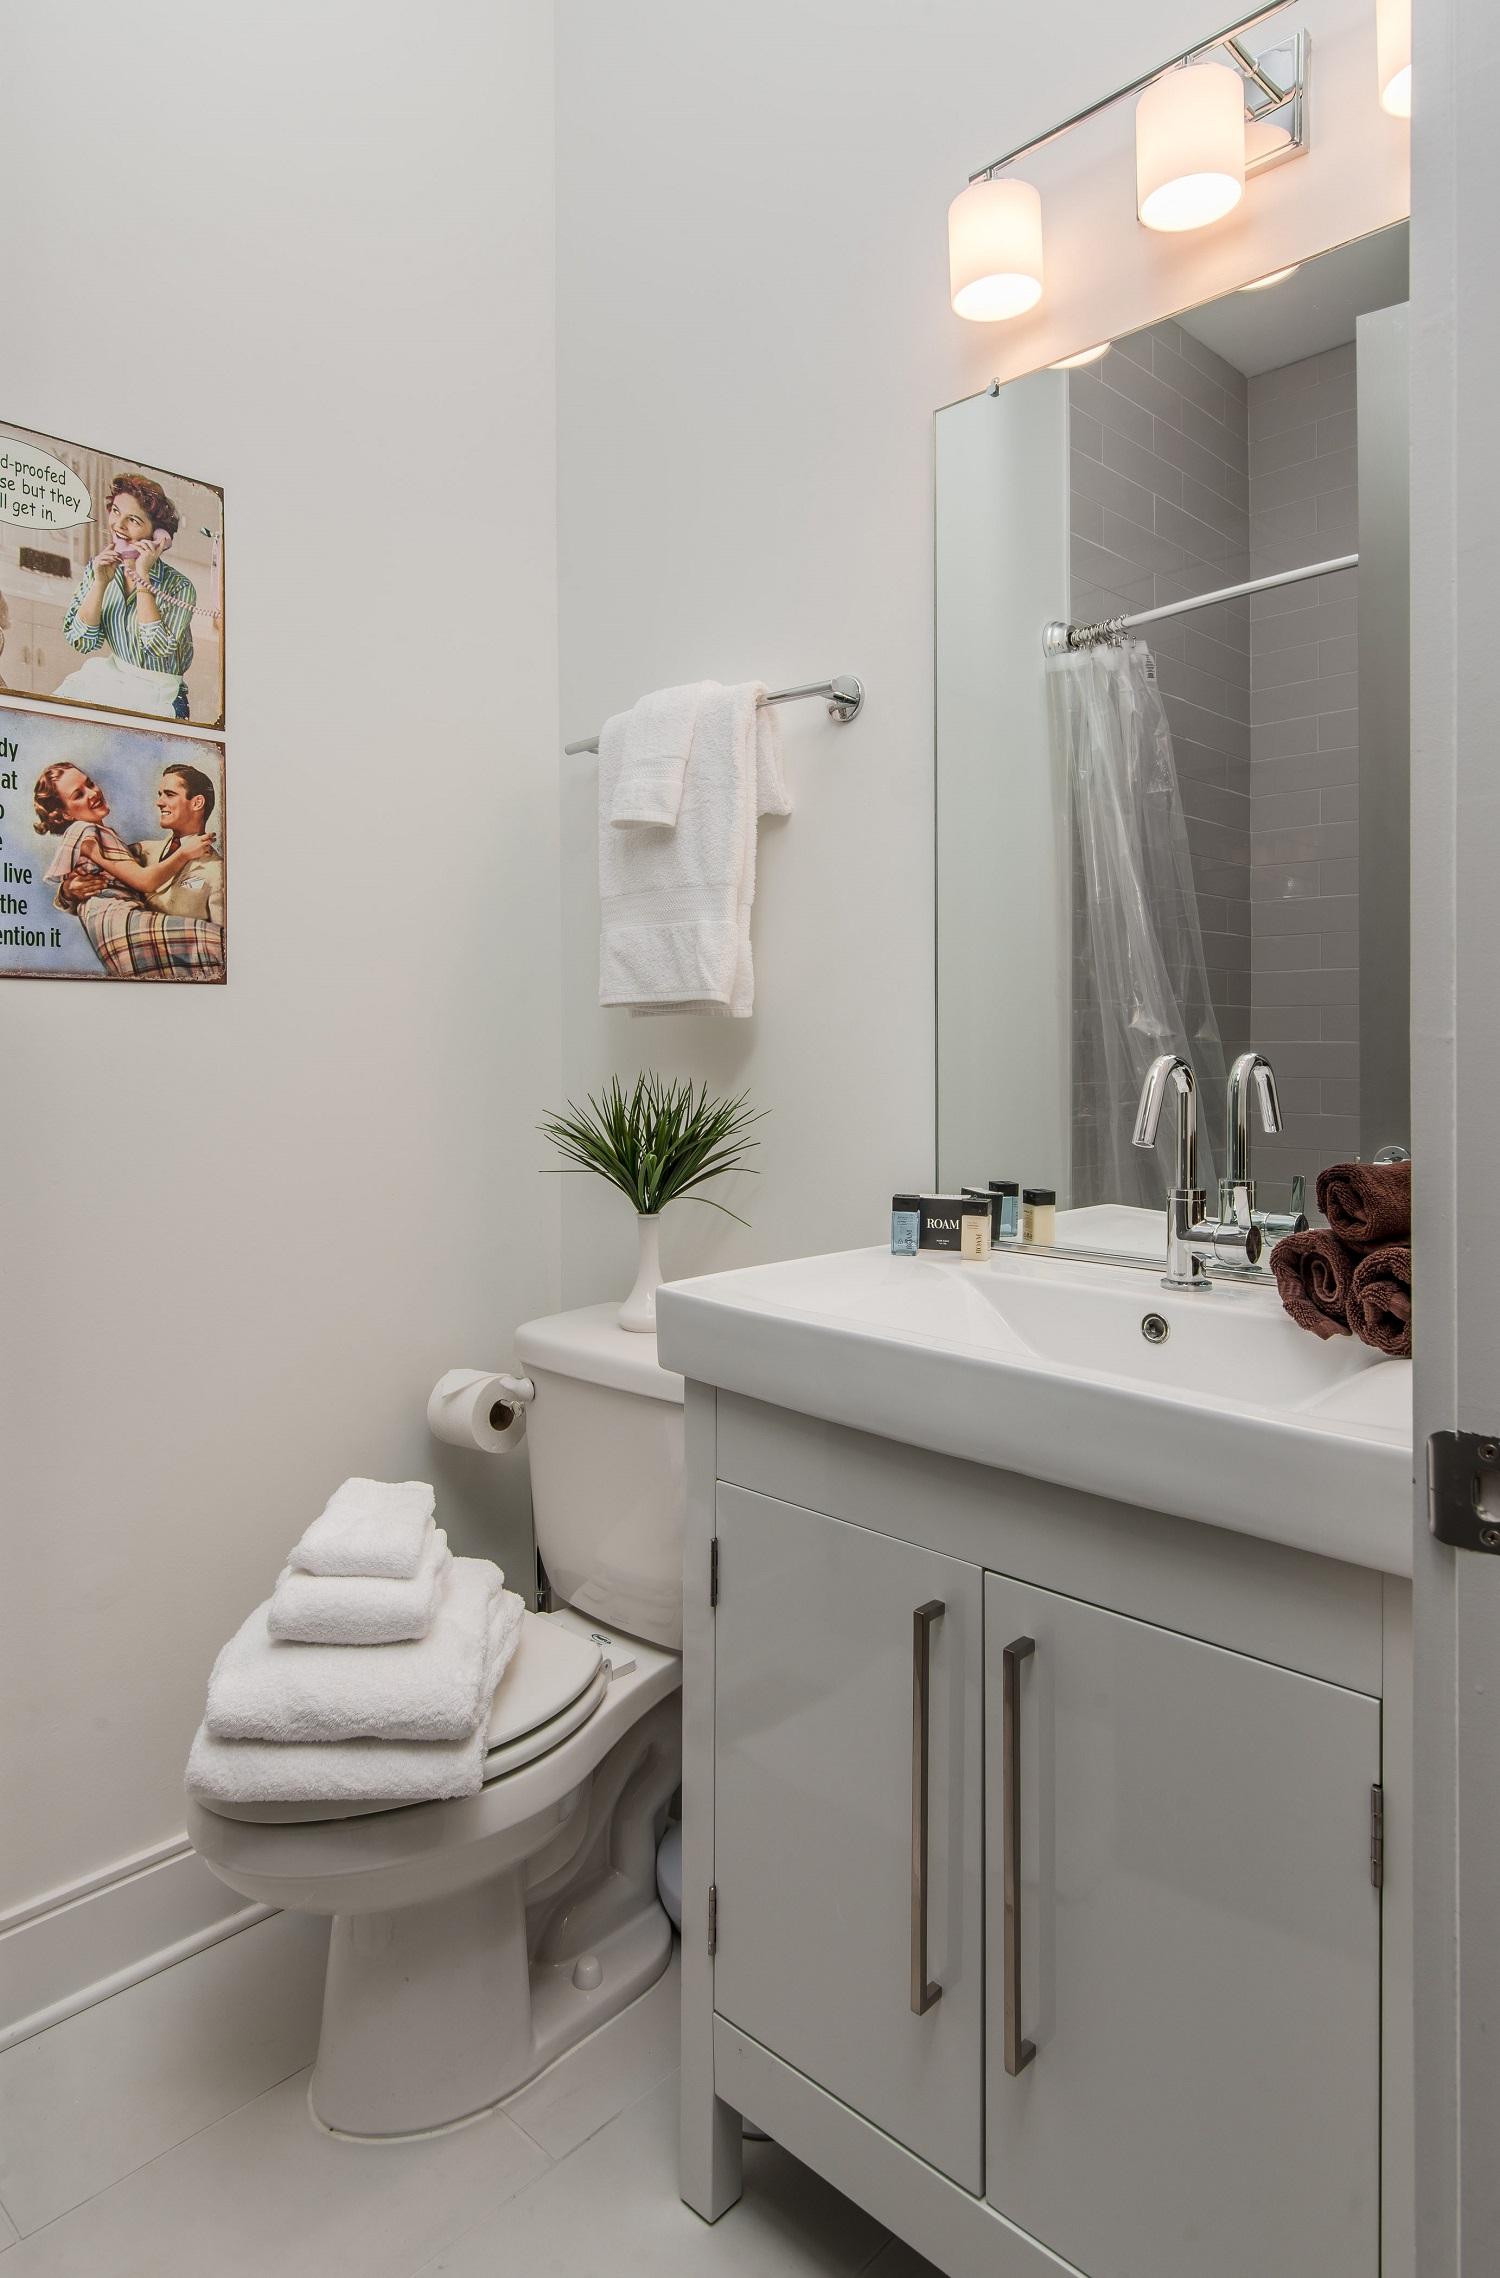 Bathroom Sinks Nashville Tn bathroom | playlist properties